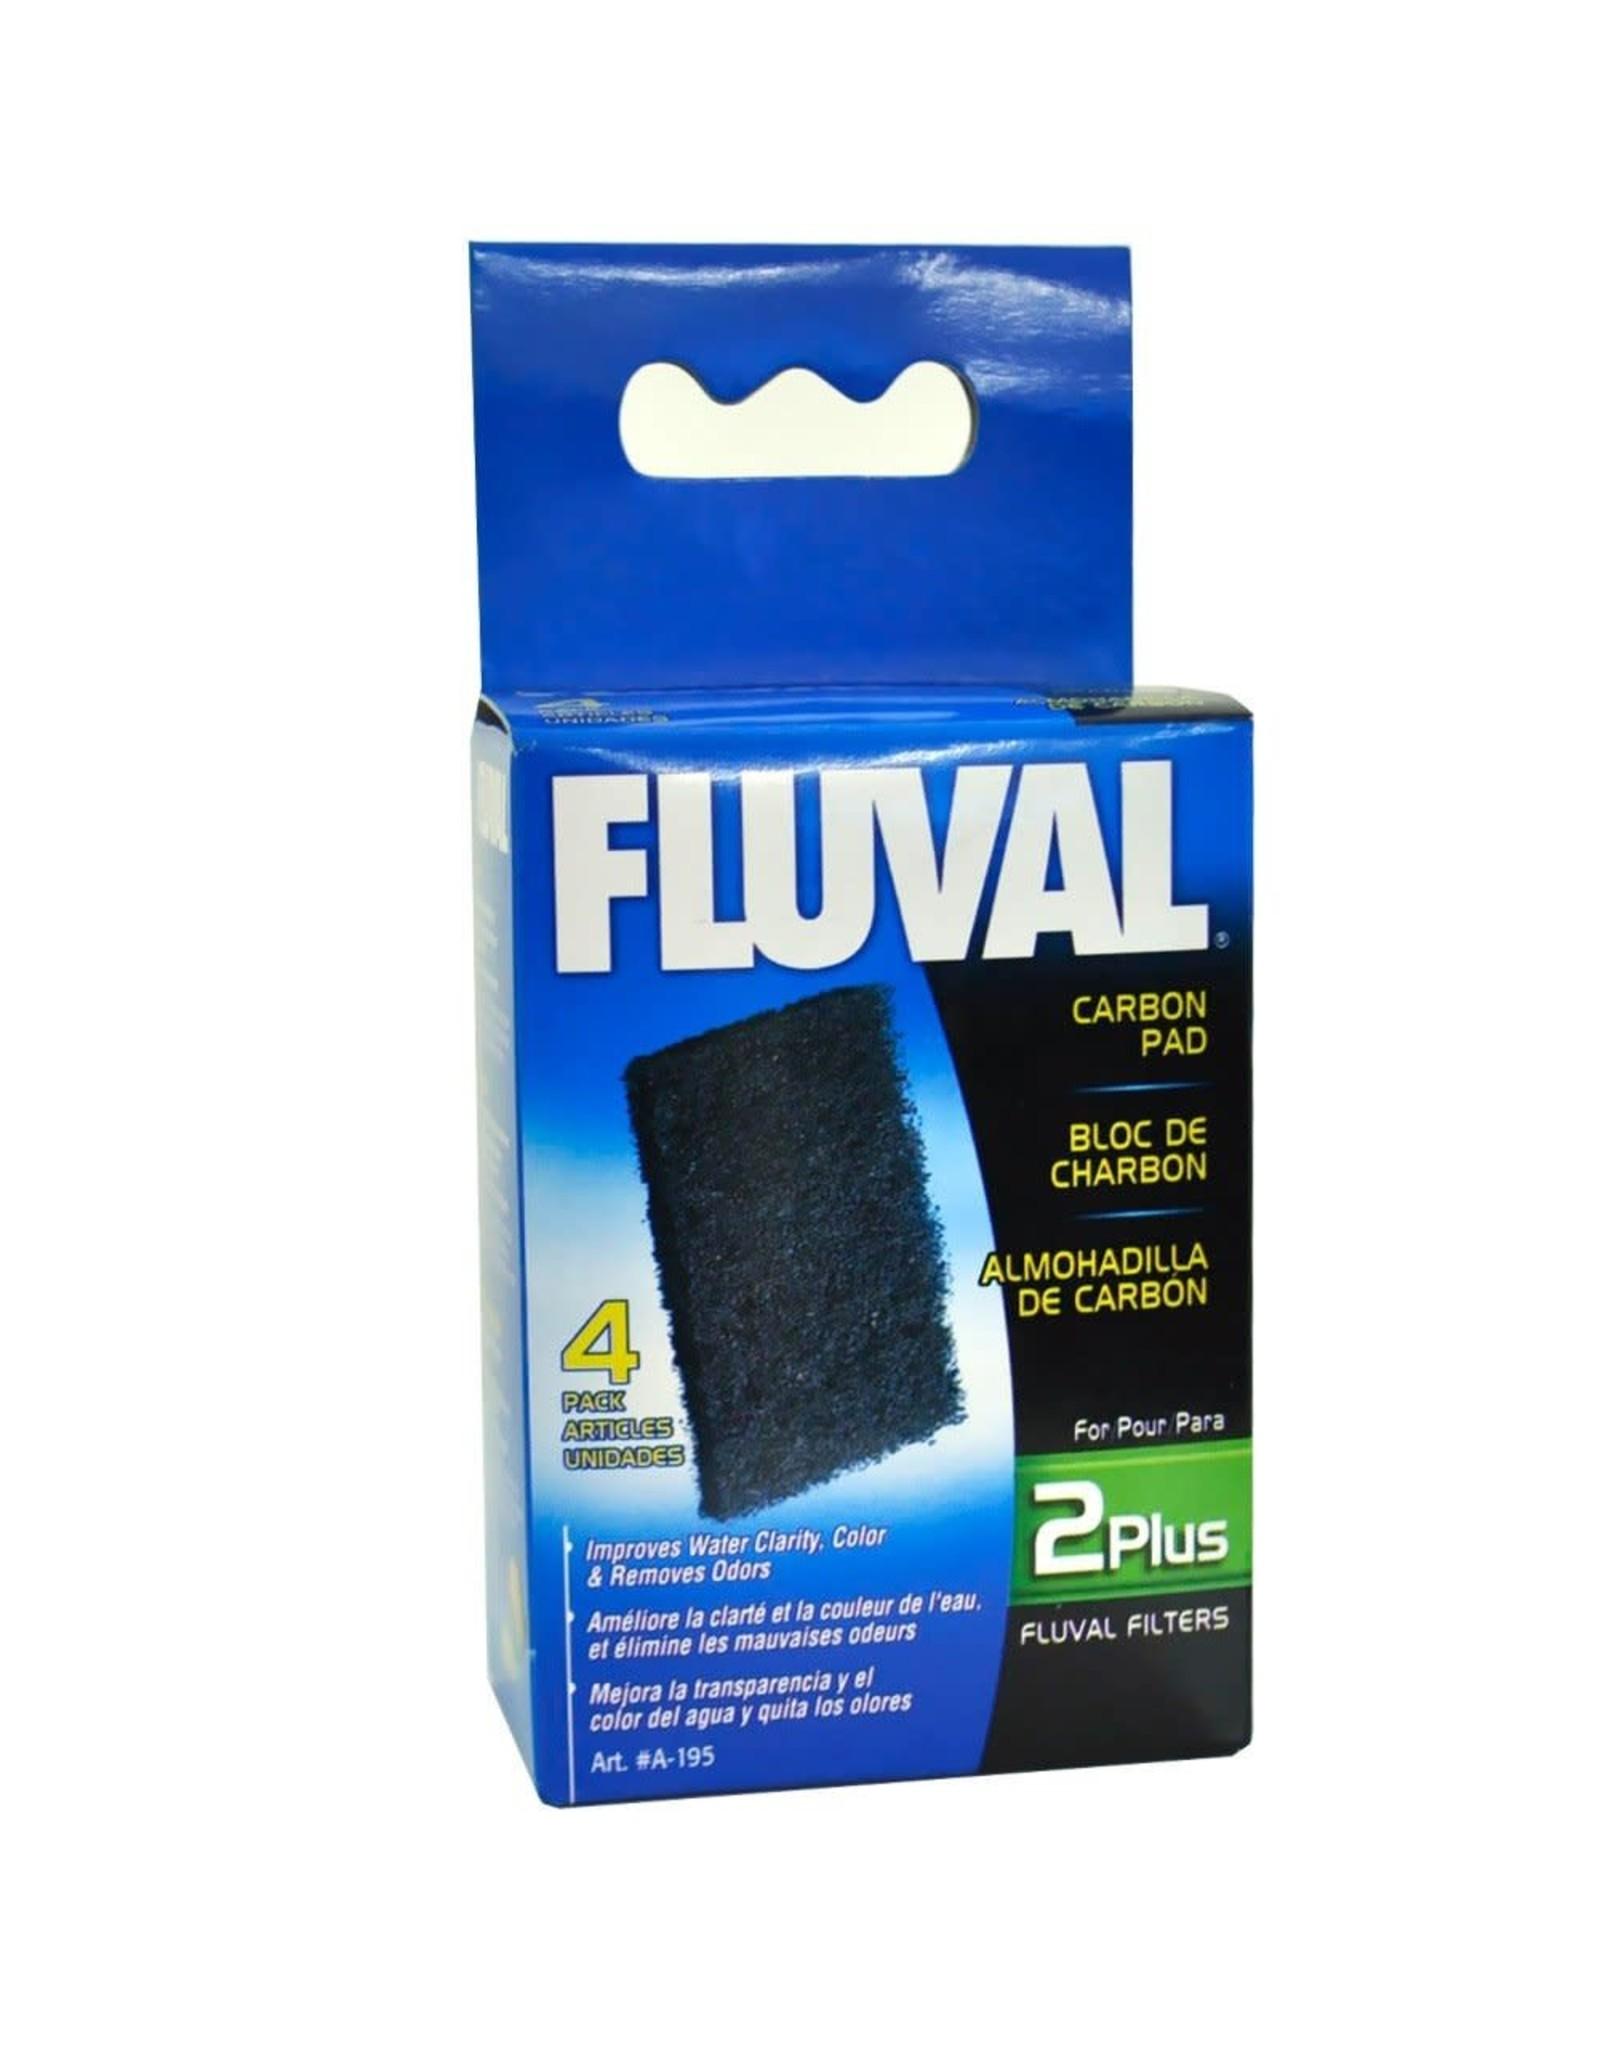 Fluval Fluval 2 Plus Special Carbon Pads - 4 pack